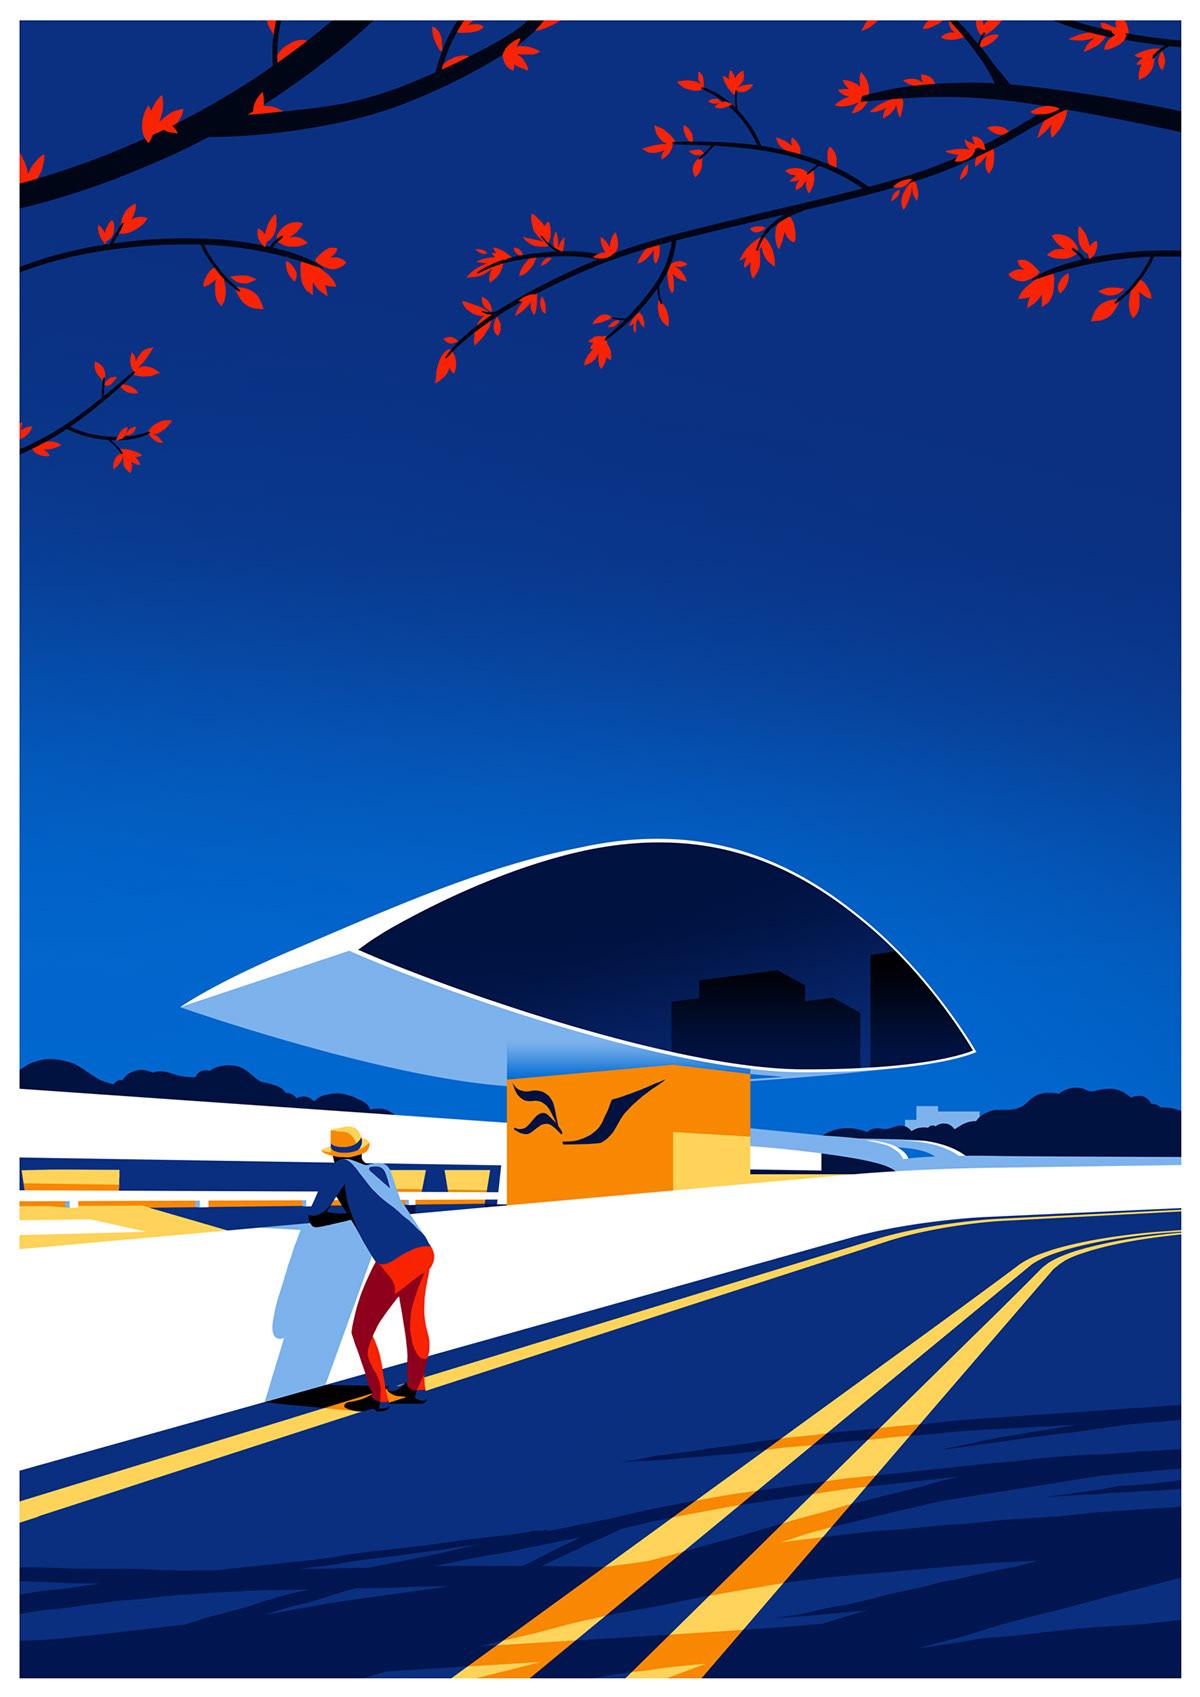 Illustration Celebrating Modernist Architecture of Oscar Niemeyer